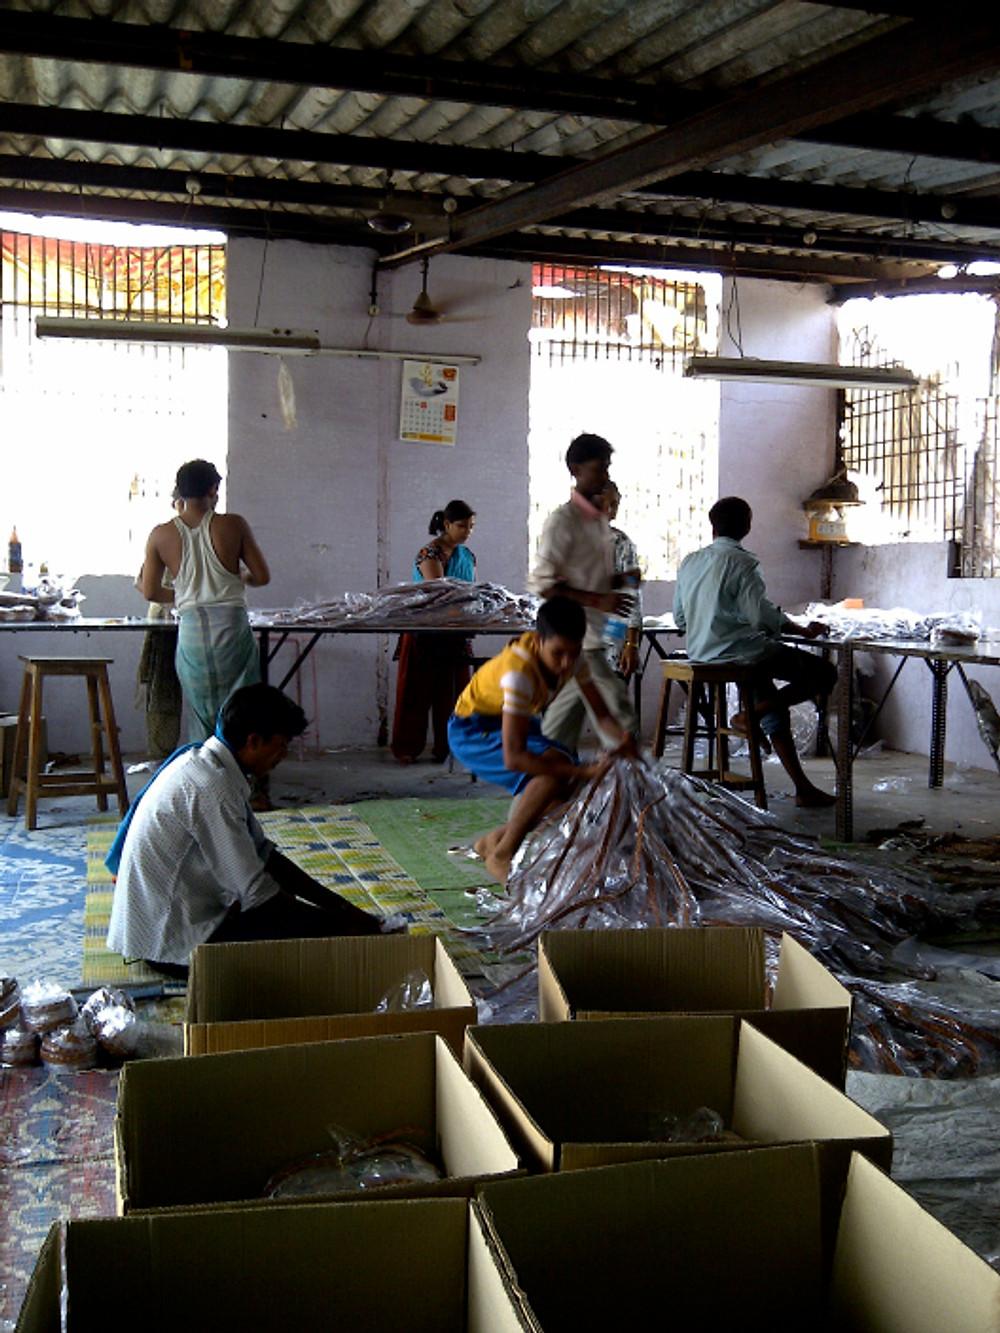 Inside the slum factory